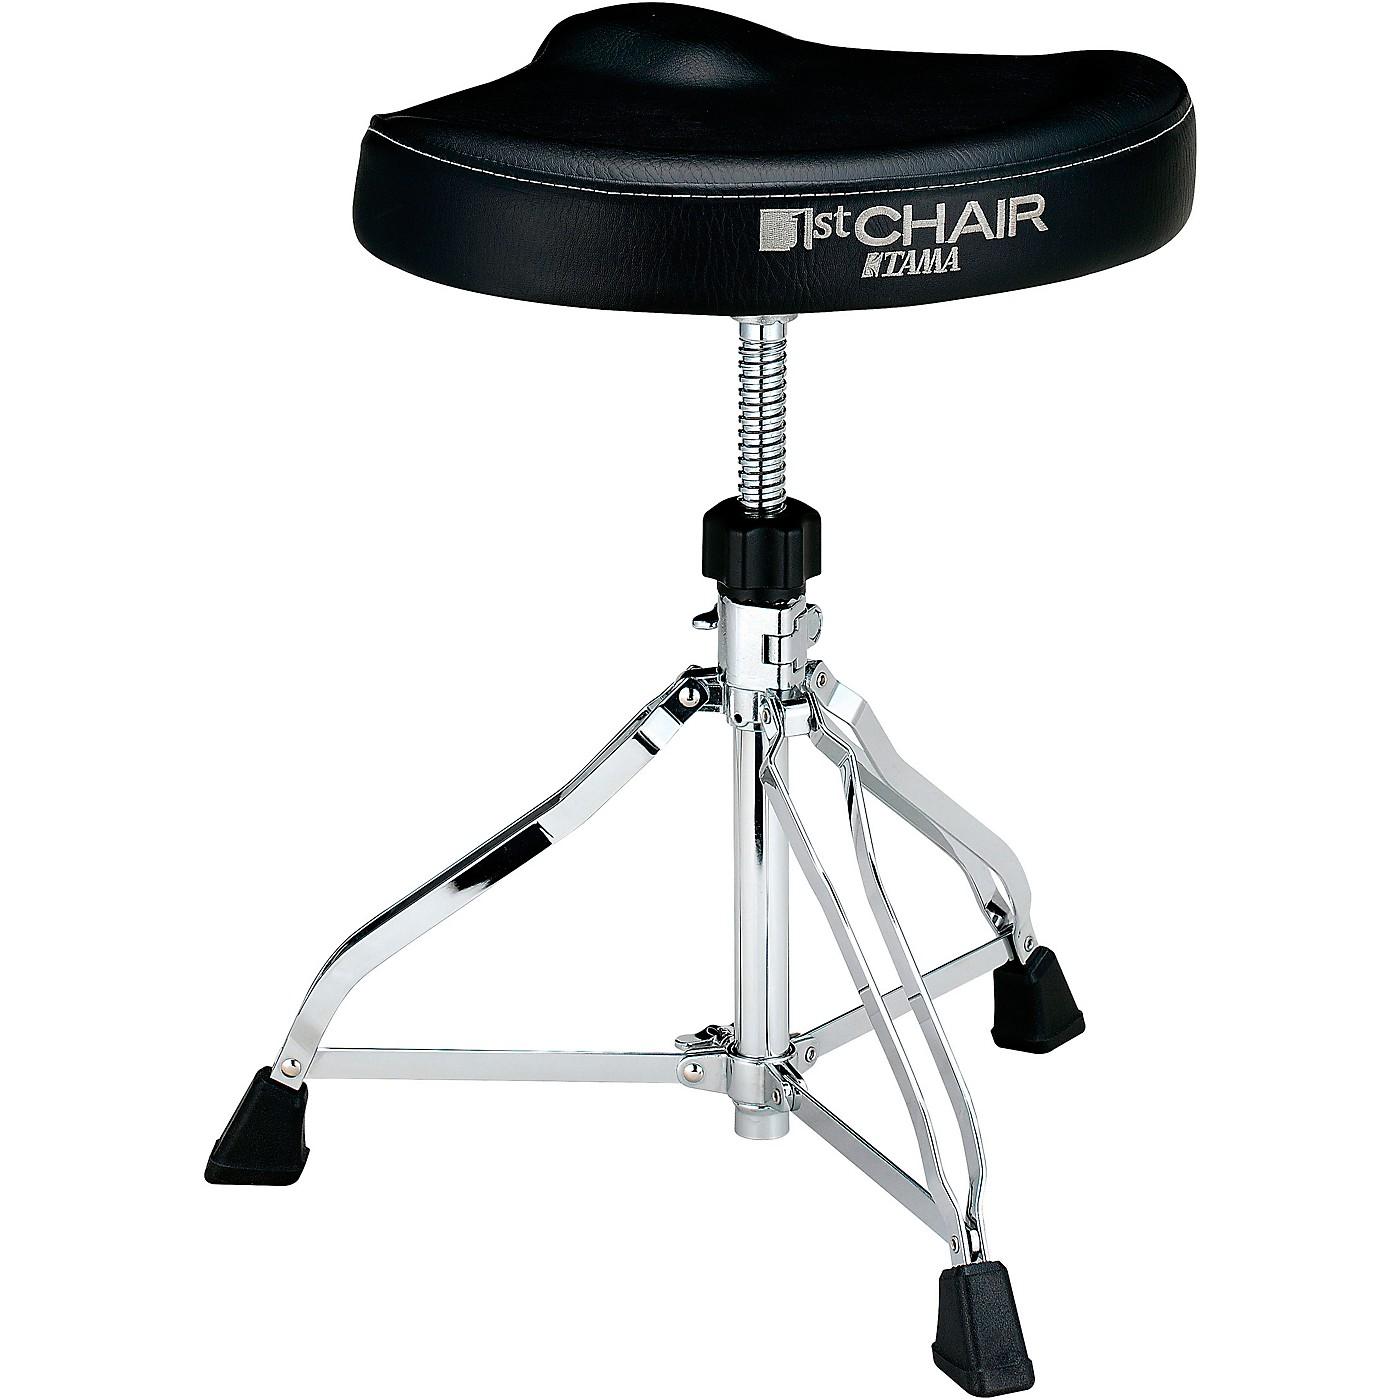 TAMA 1st Chair Saddle Seat Drum Throne thumbnail